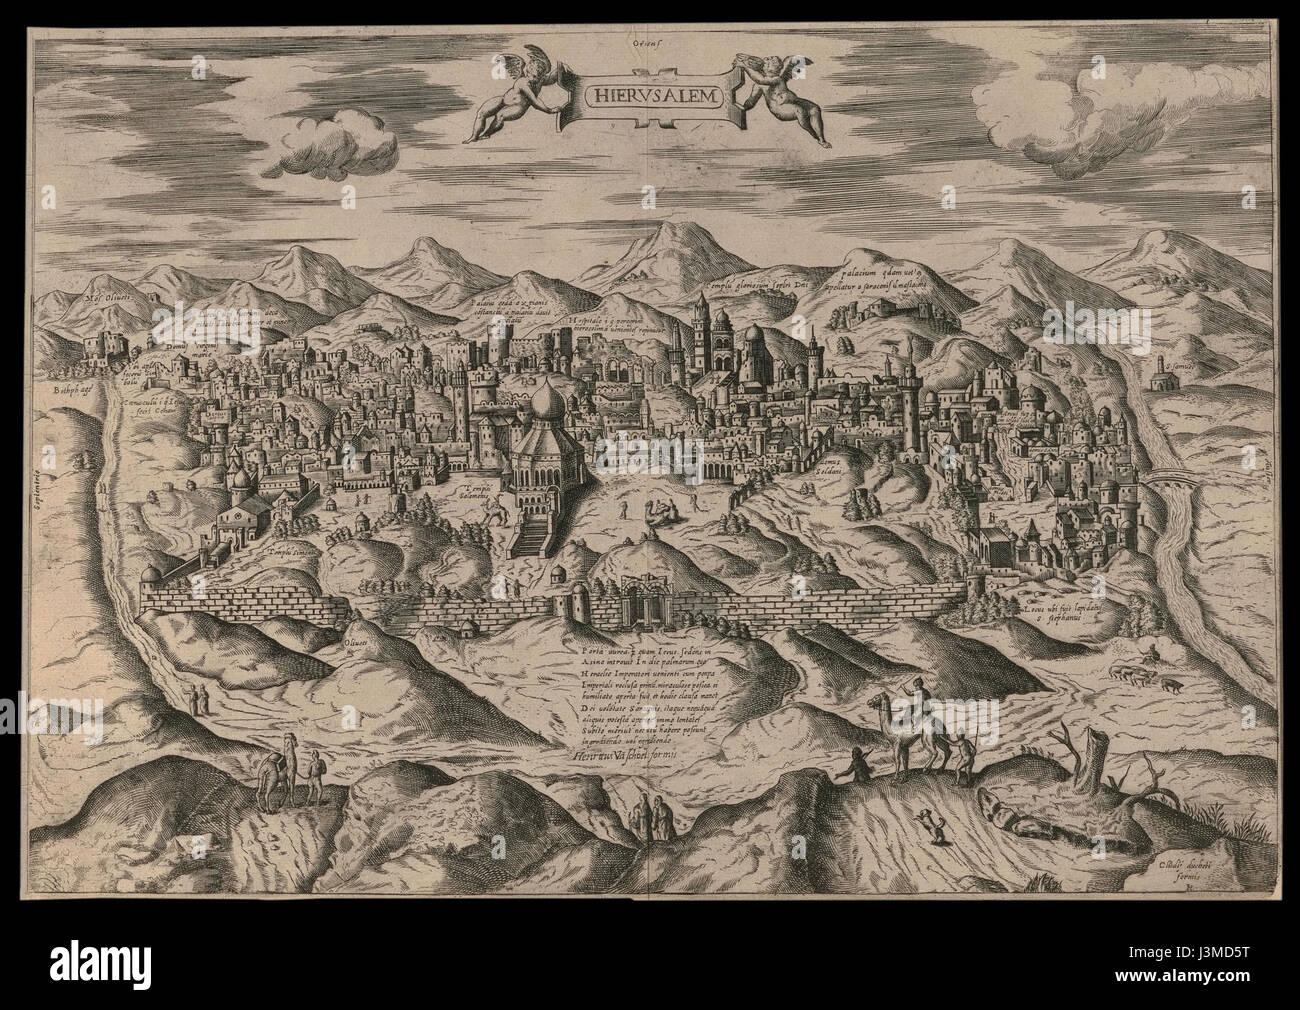 Hierusalem   Henricus Vaschoel formis Stock Photo